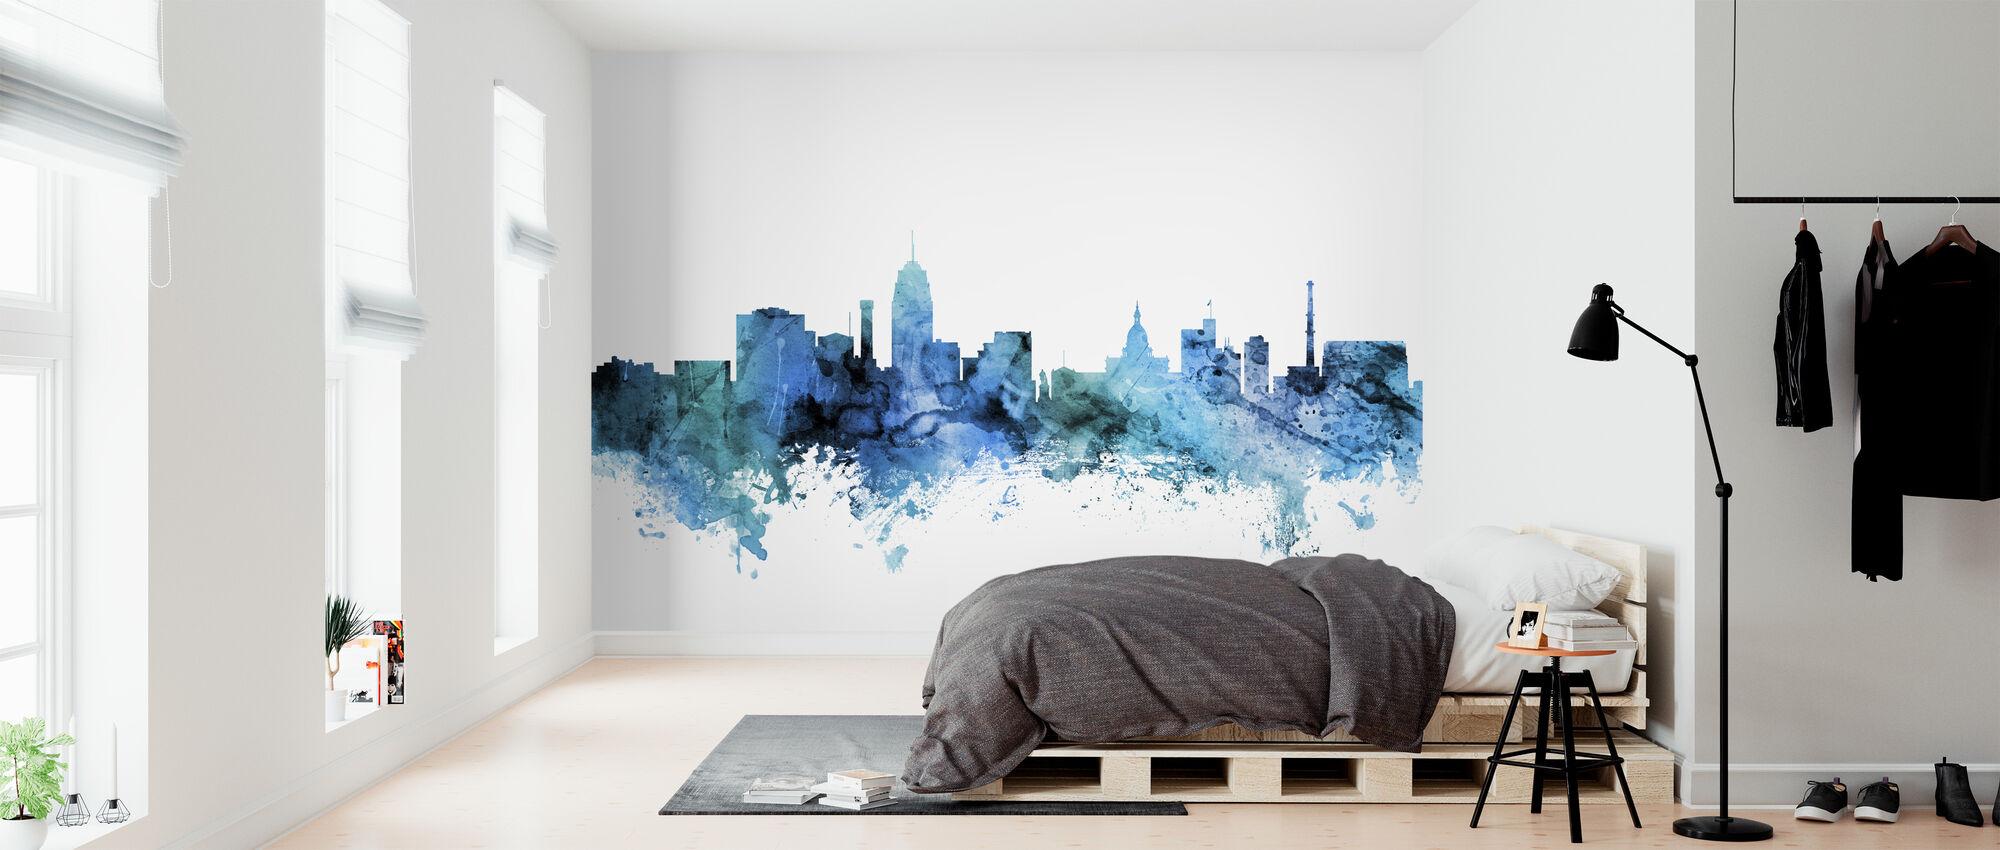 Lansing Michigan Skyline - Wallpaper - Bedroom